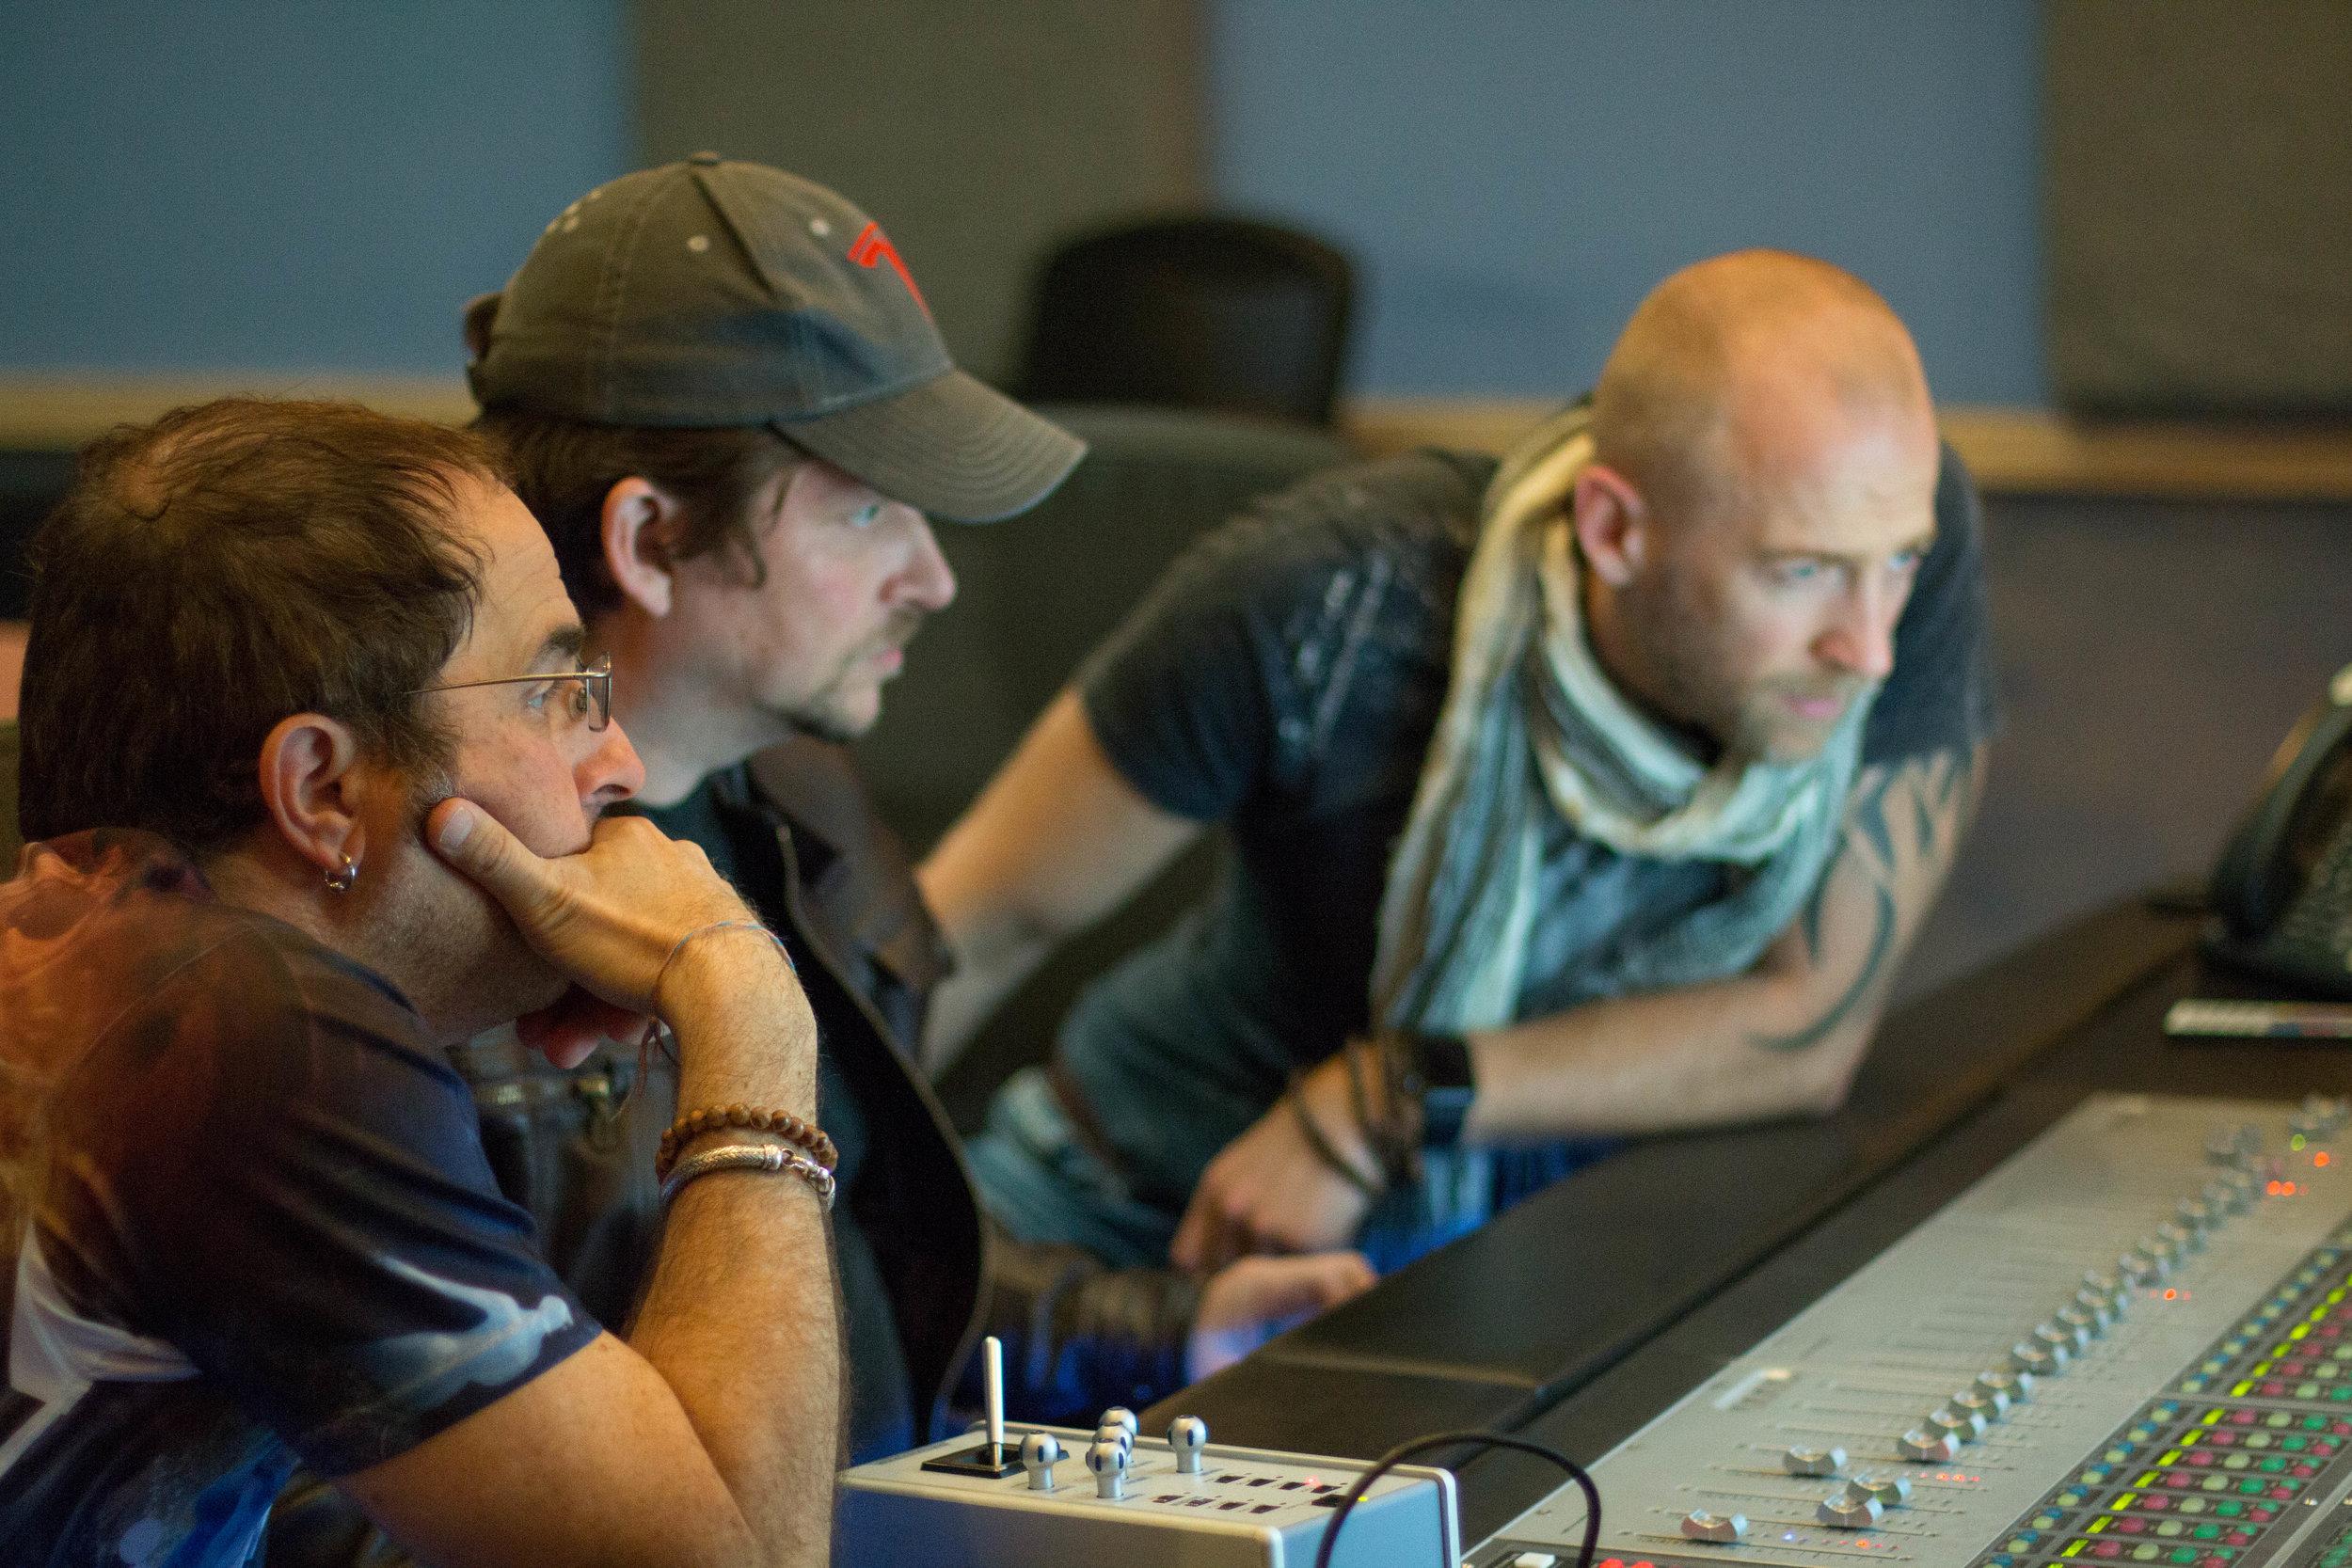 Left to right: Greg Gordon, Bryan Franklin & Rain Phutureprimitive